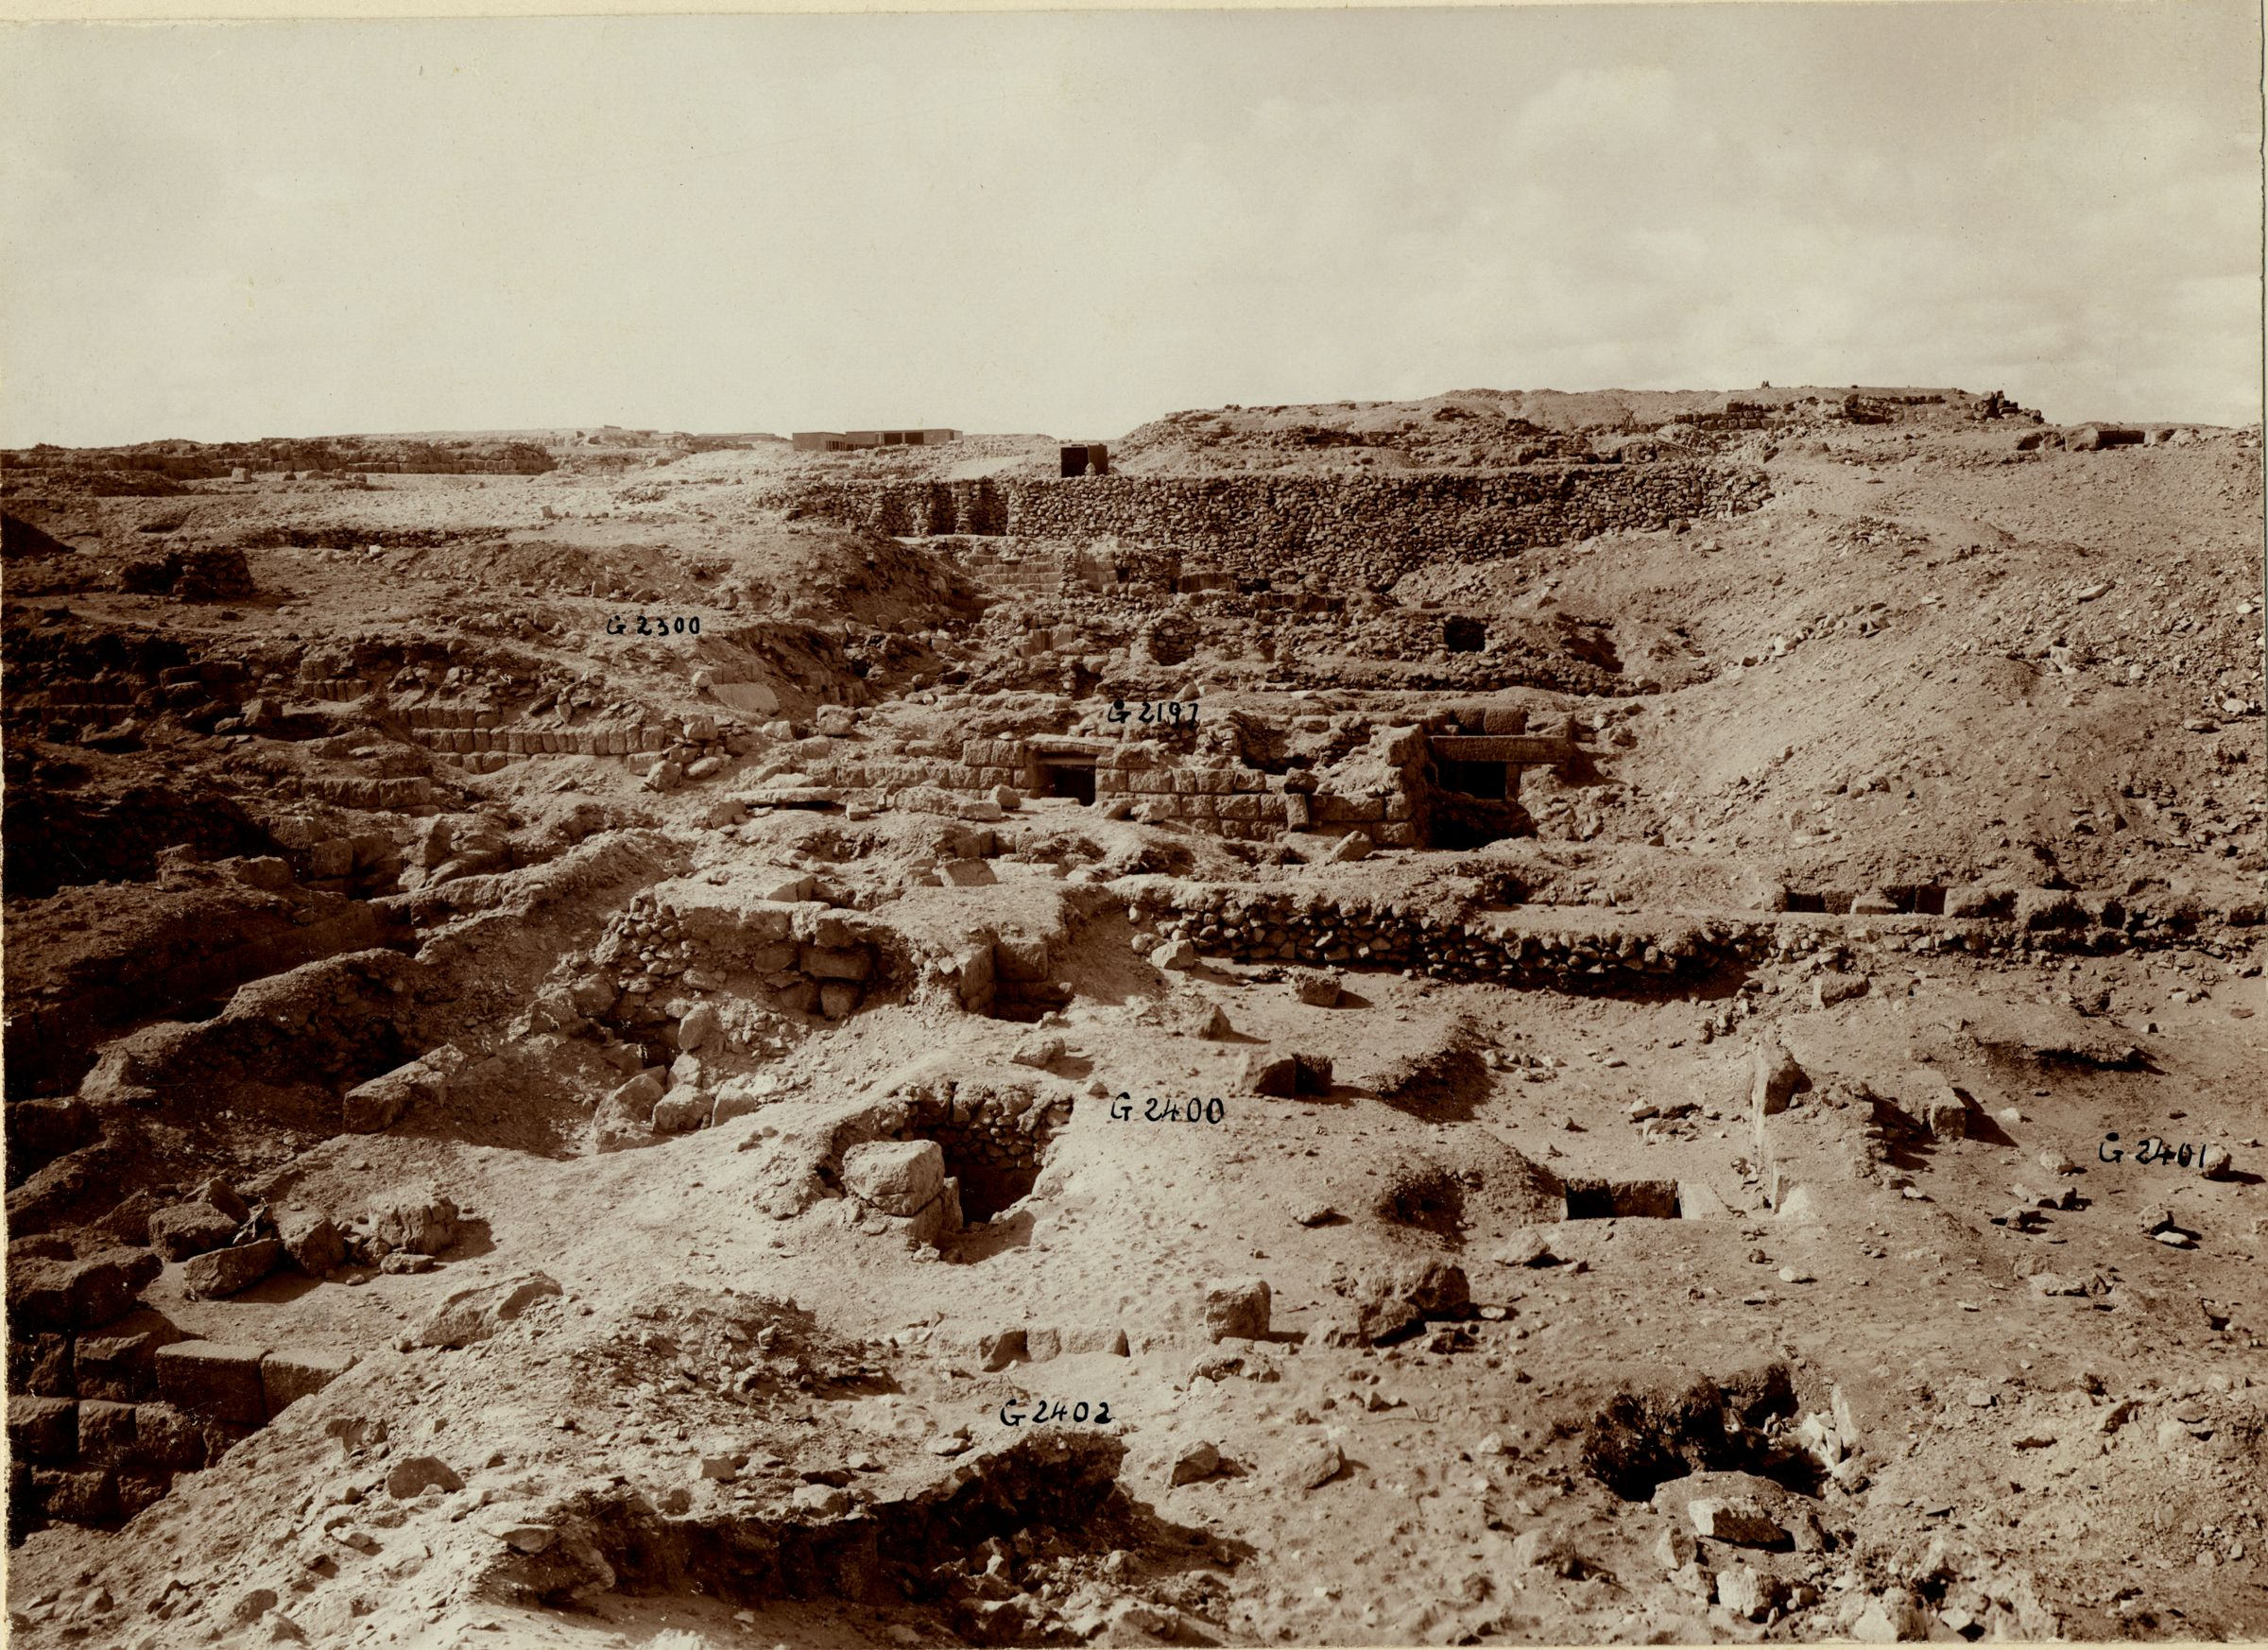 Western Cemetery: Site: Giza; View: G 2402, G 2400, G 2197, G 2300 = G 5190